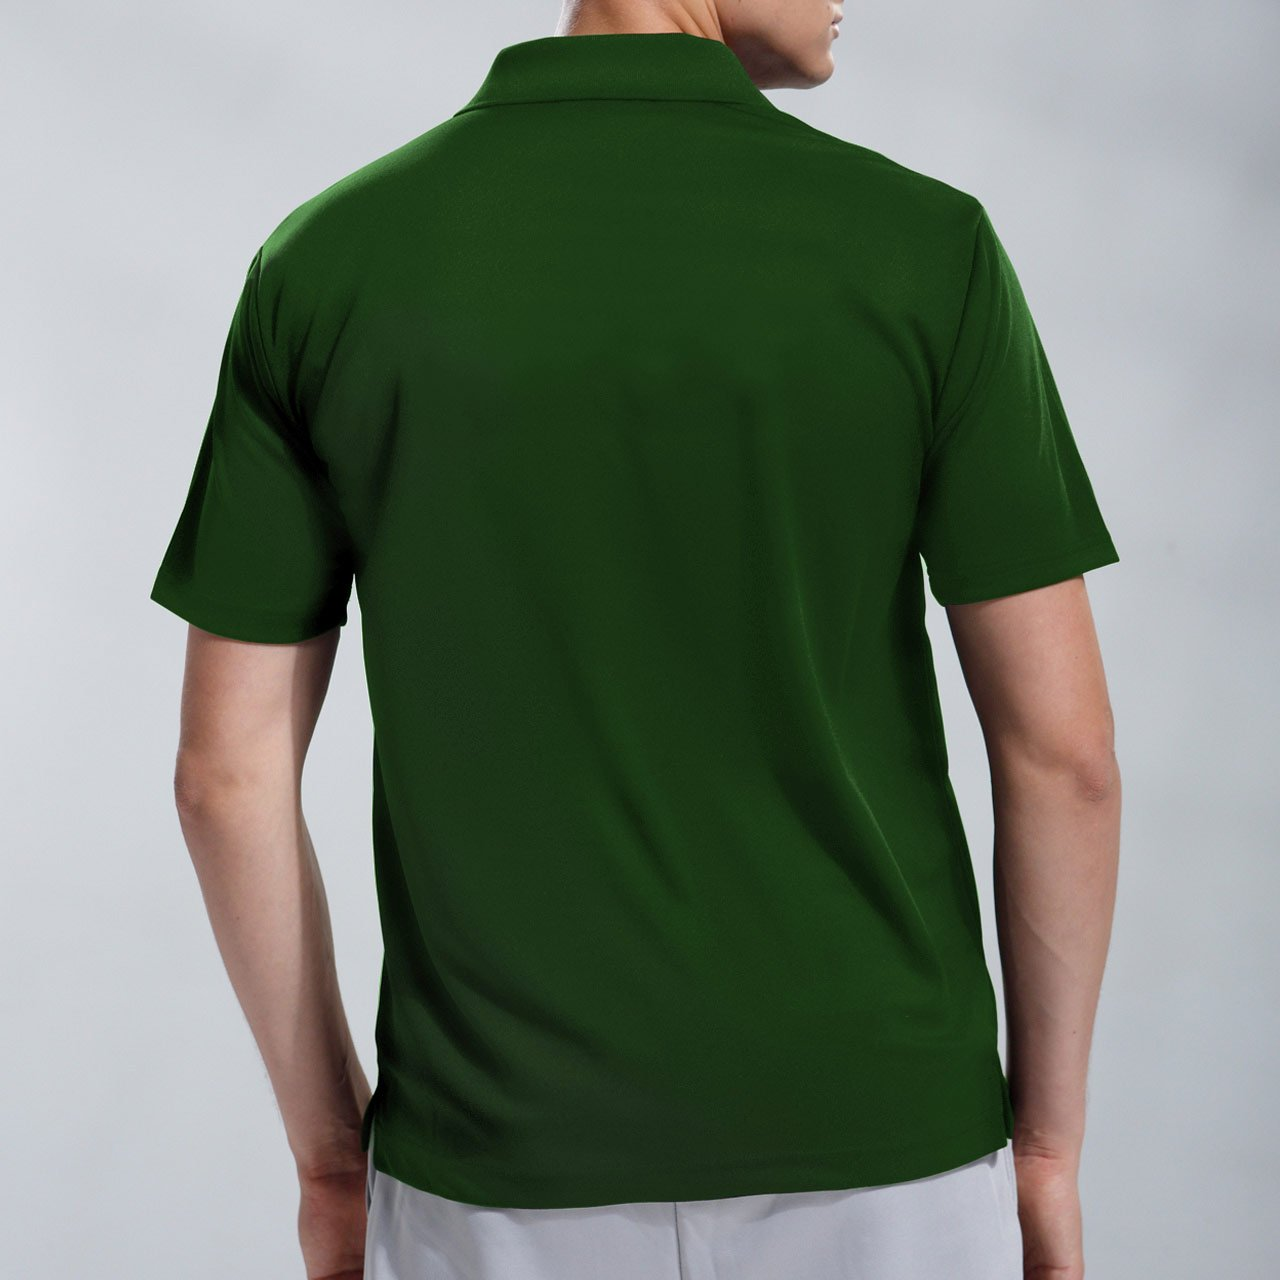 51 ?Green Wundou Boys Sports Dry Light Polo-Shirts P335?130CM